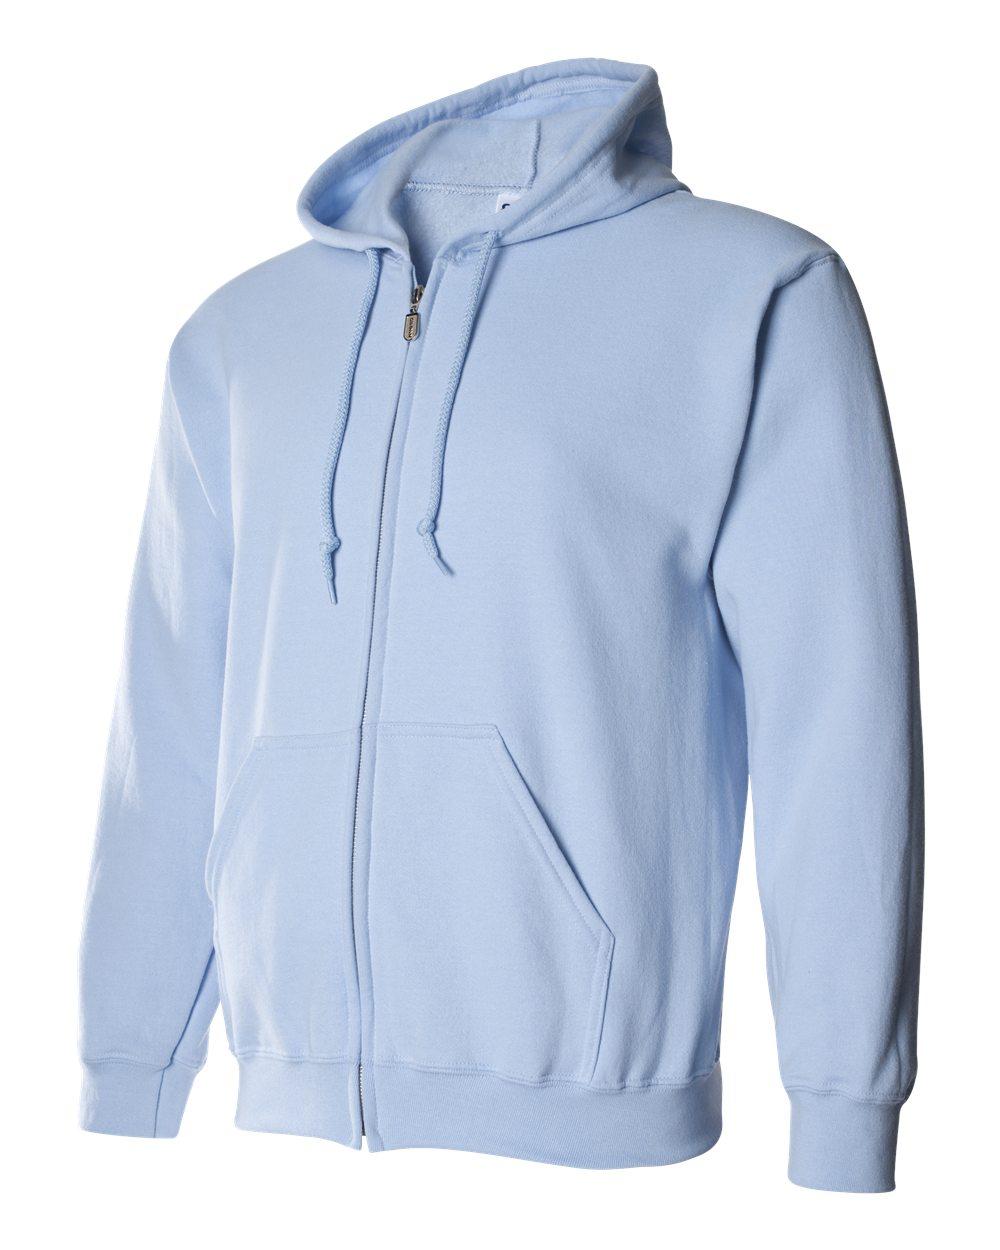 GIL18600 Light Blue